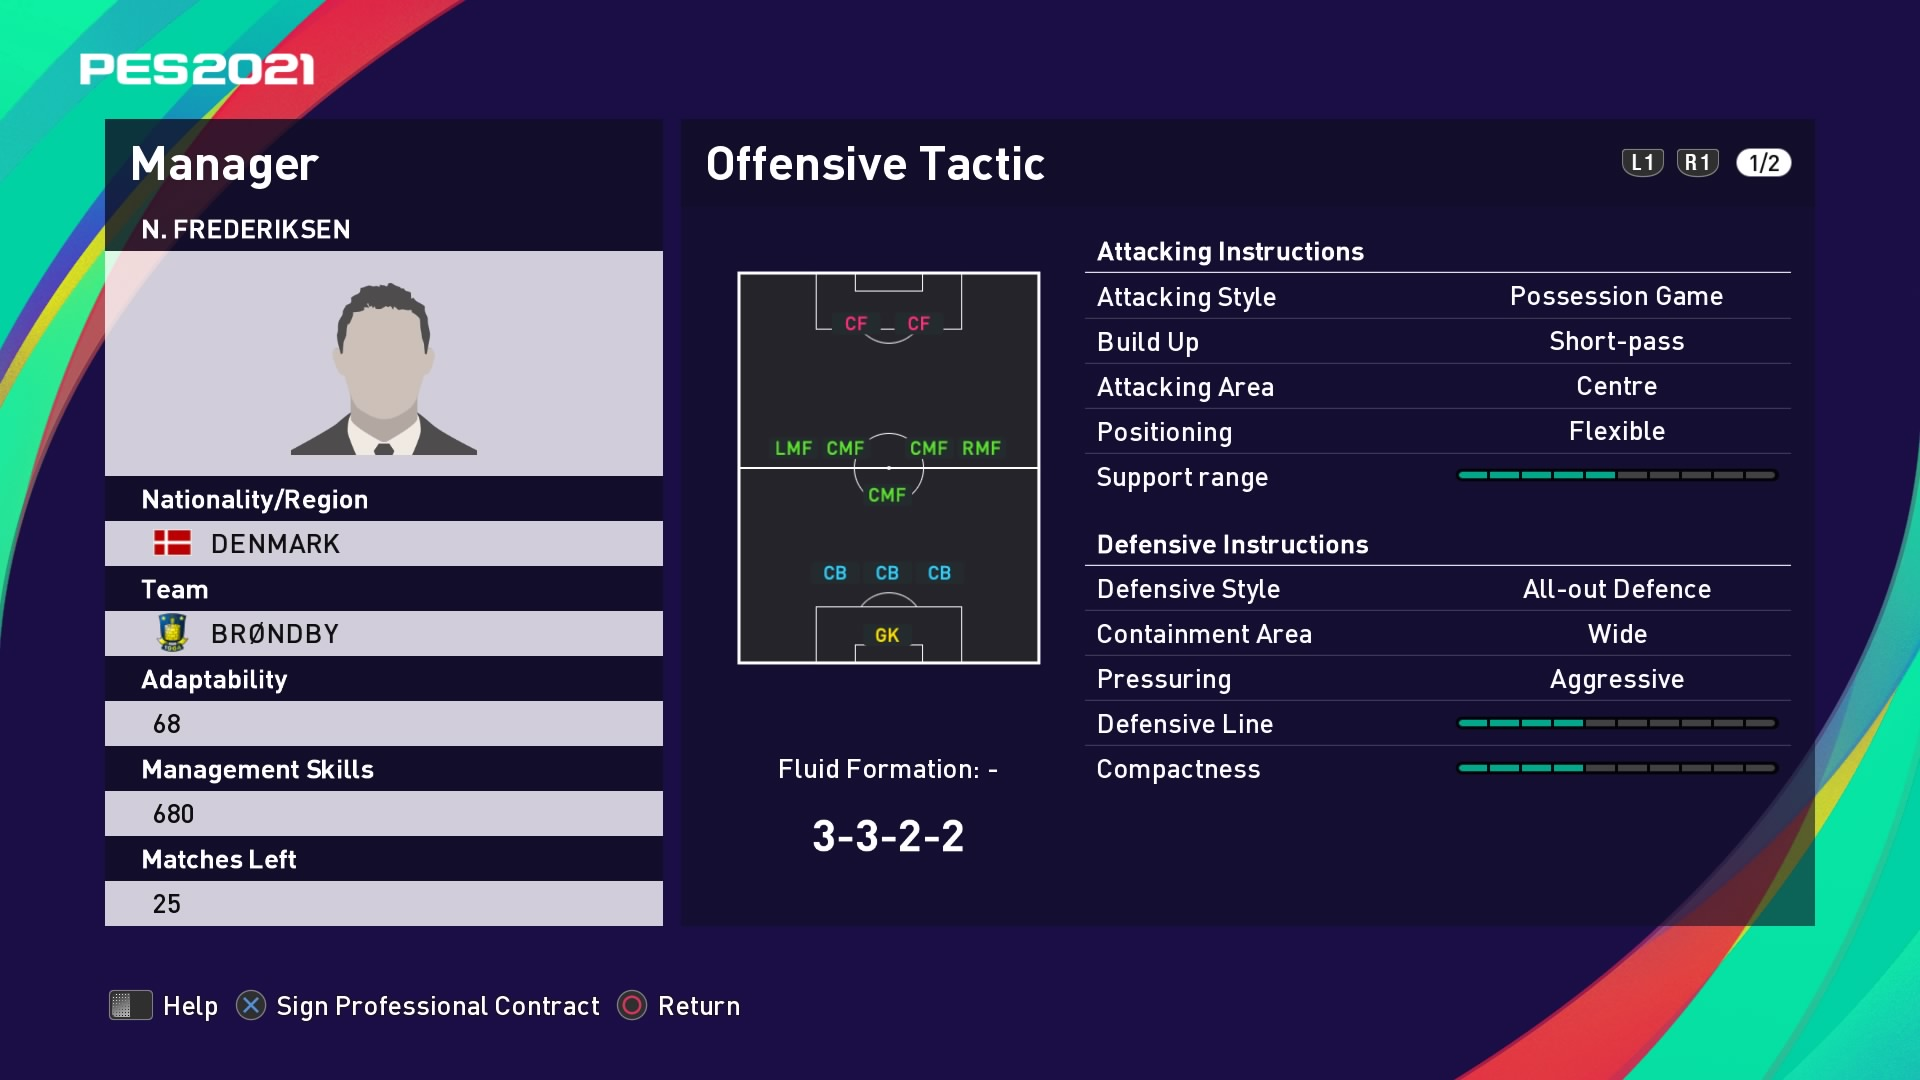 N. Frederiksen (Niels Frederiksen) Offensive Tactic in PES 2021 myClub